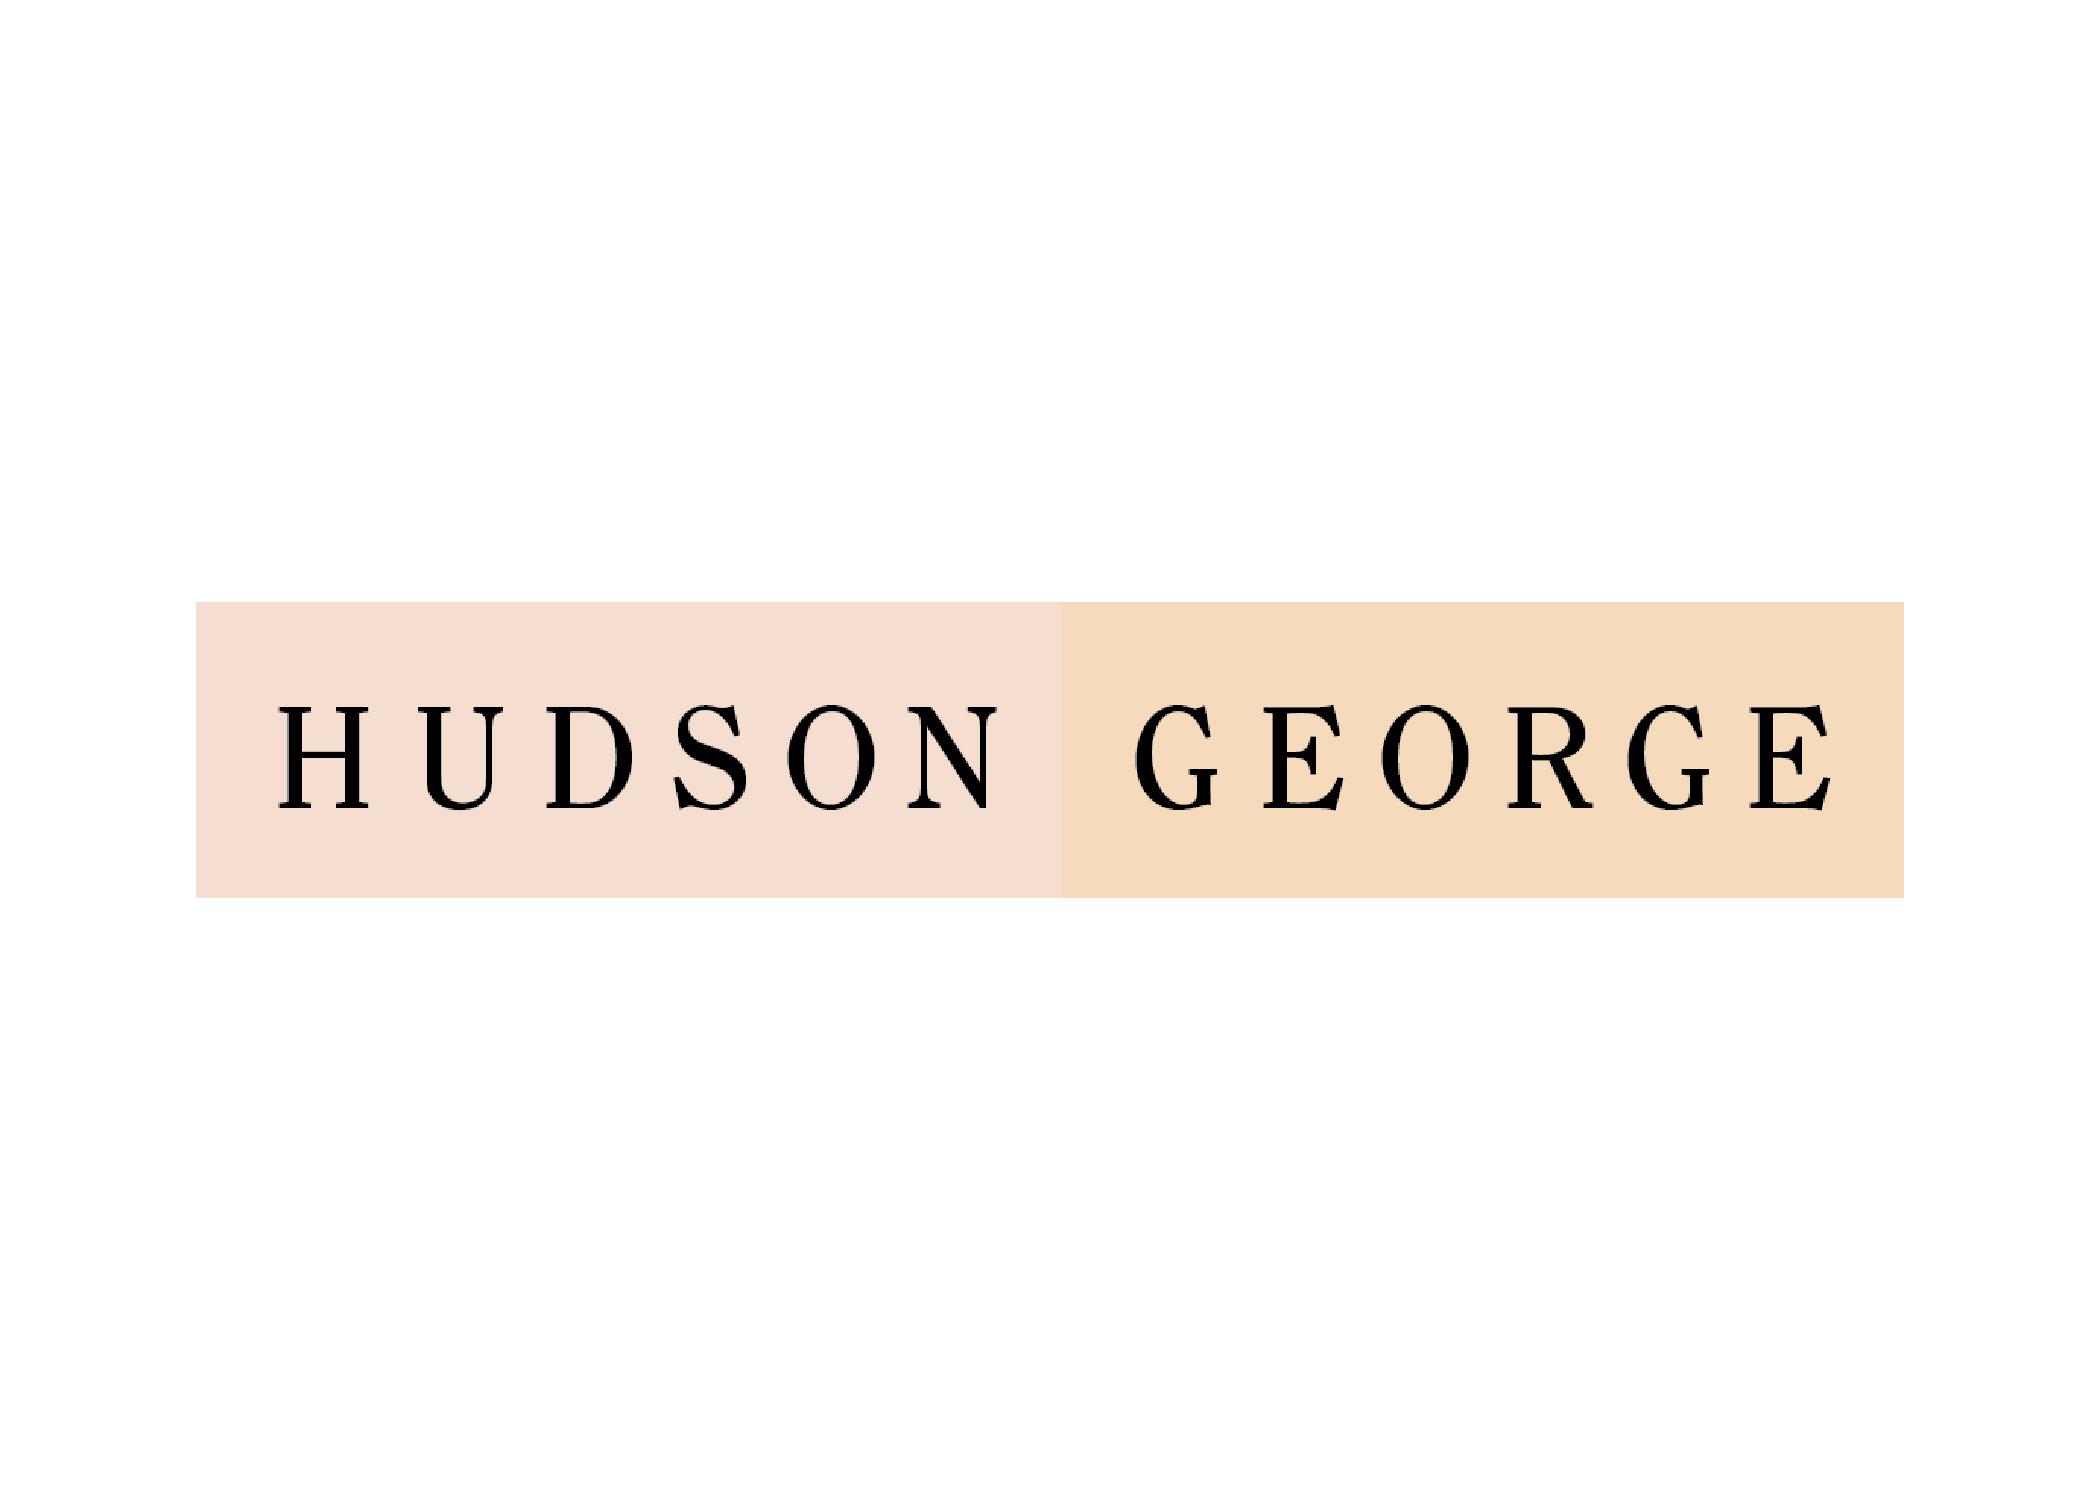 Hudson_George.png